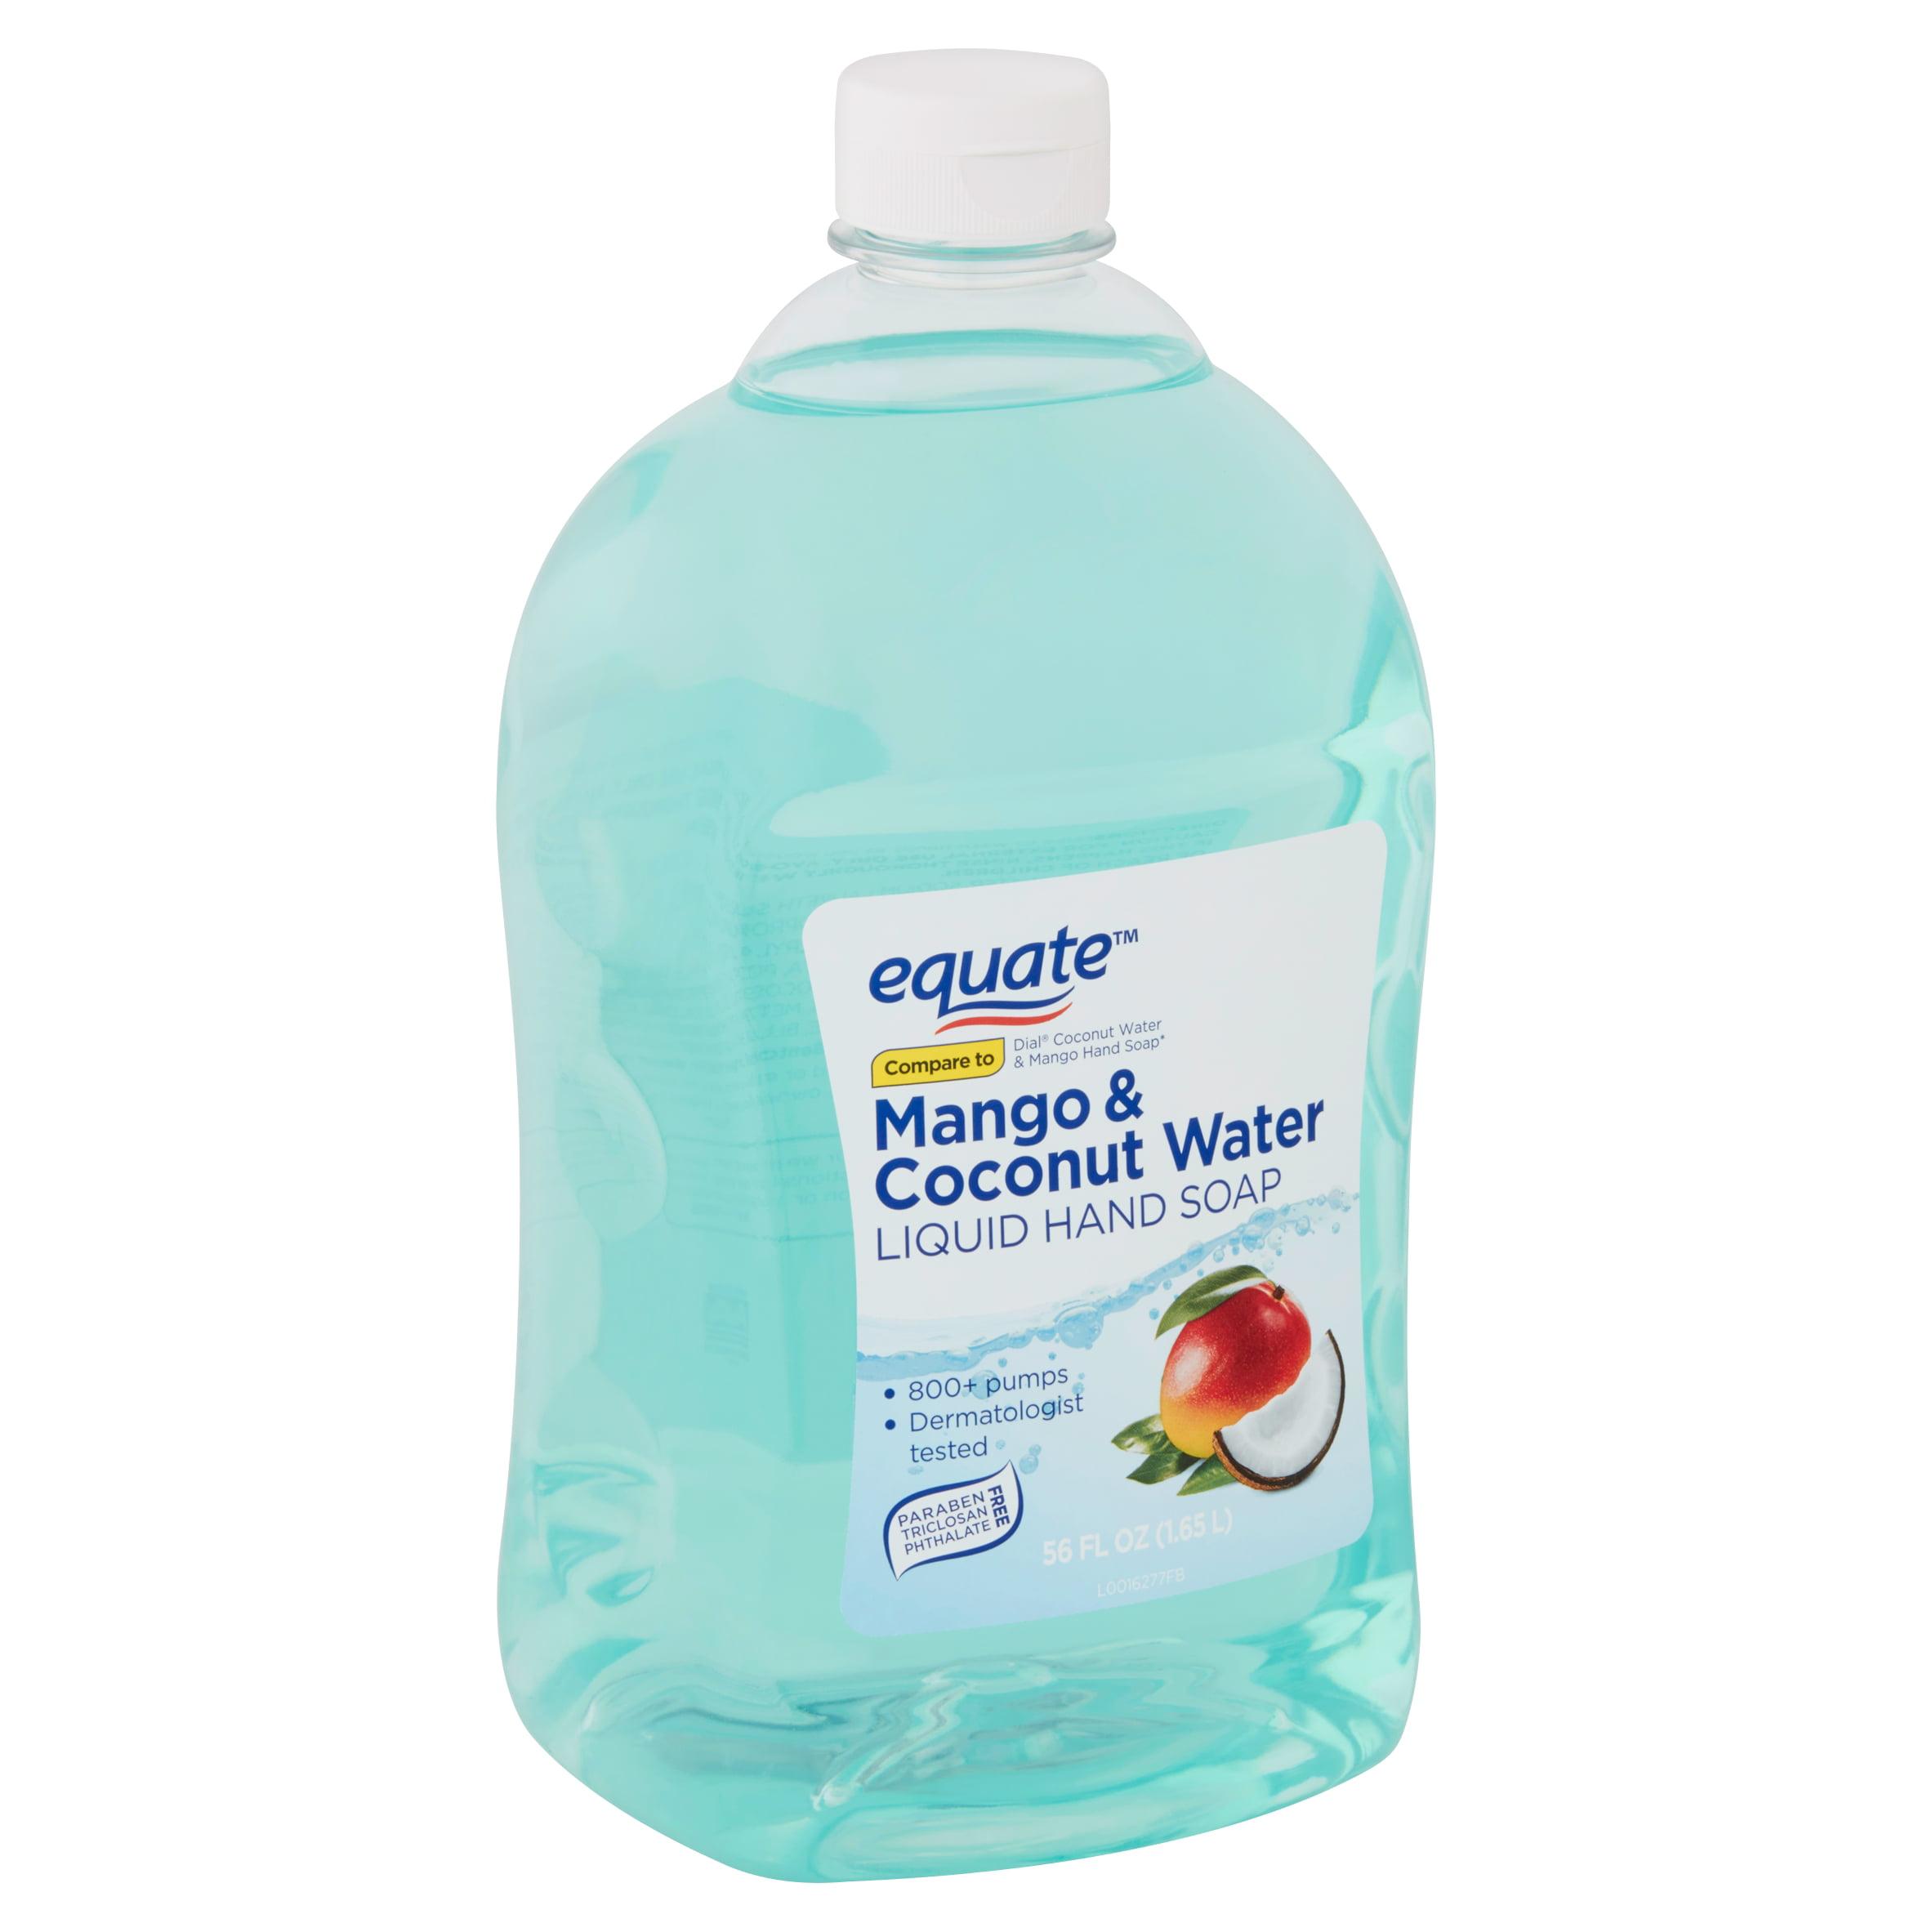 (2 pack) Equate Liquid Hand Soap, Mango & Coconut Water, 56 Oz